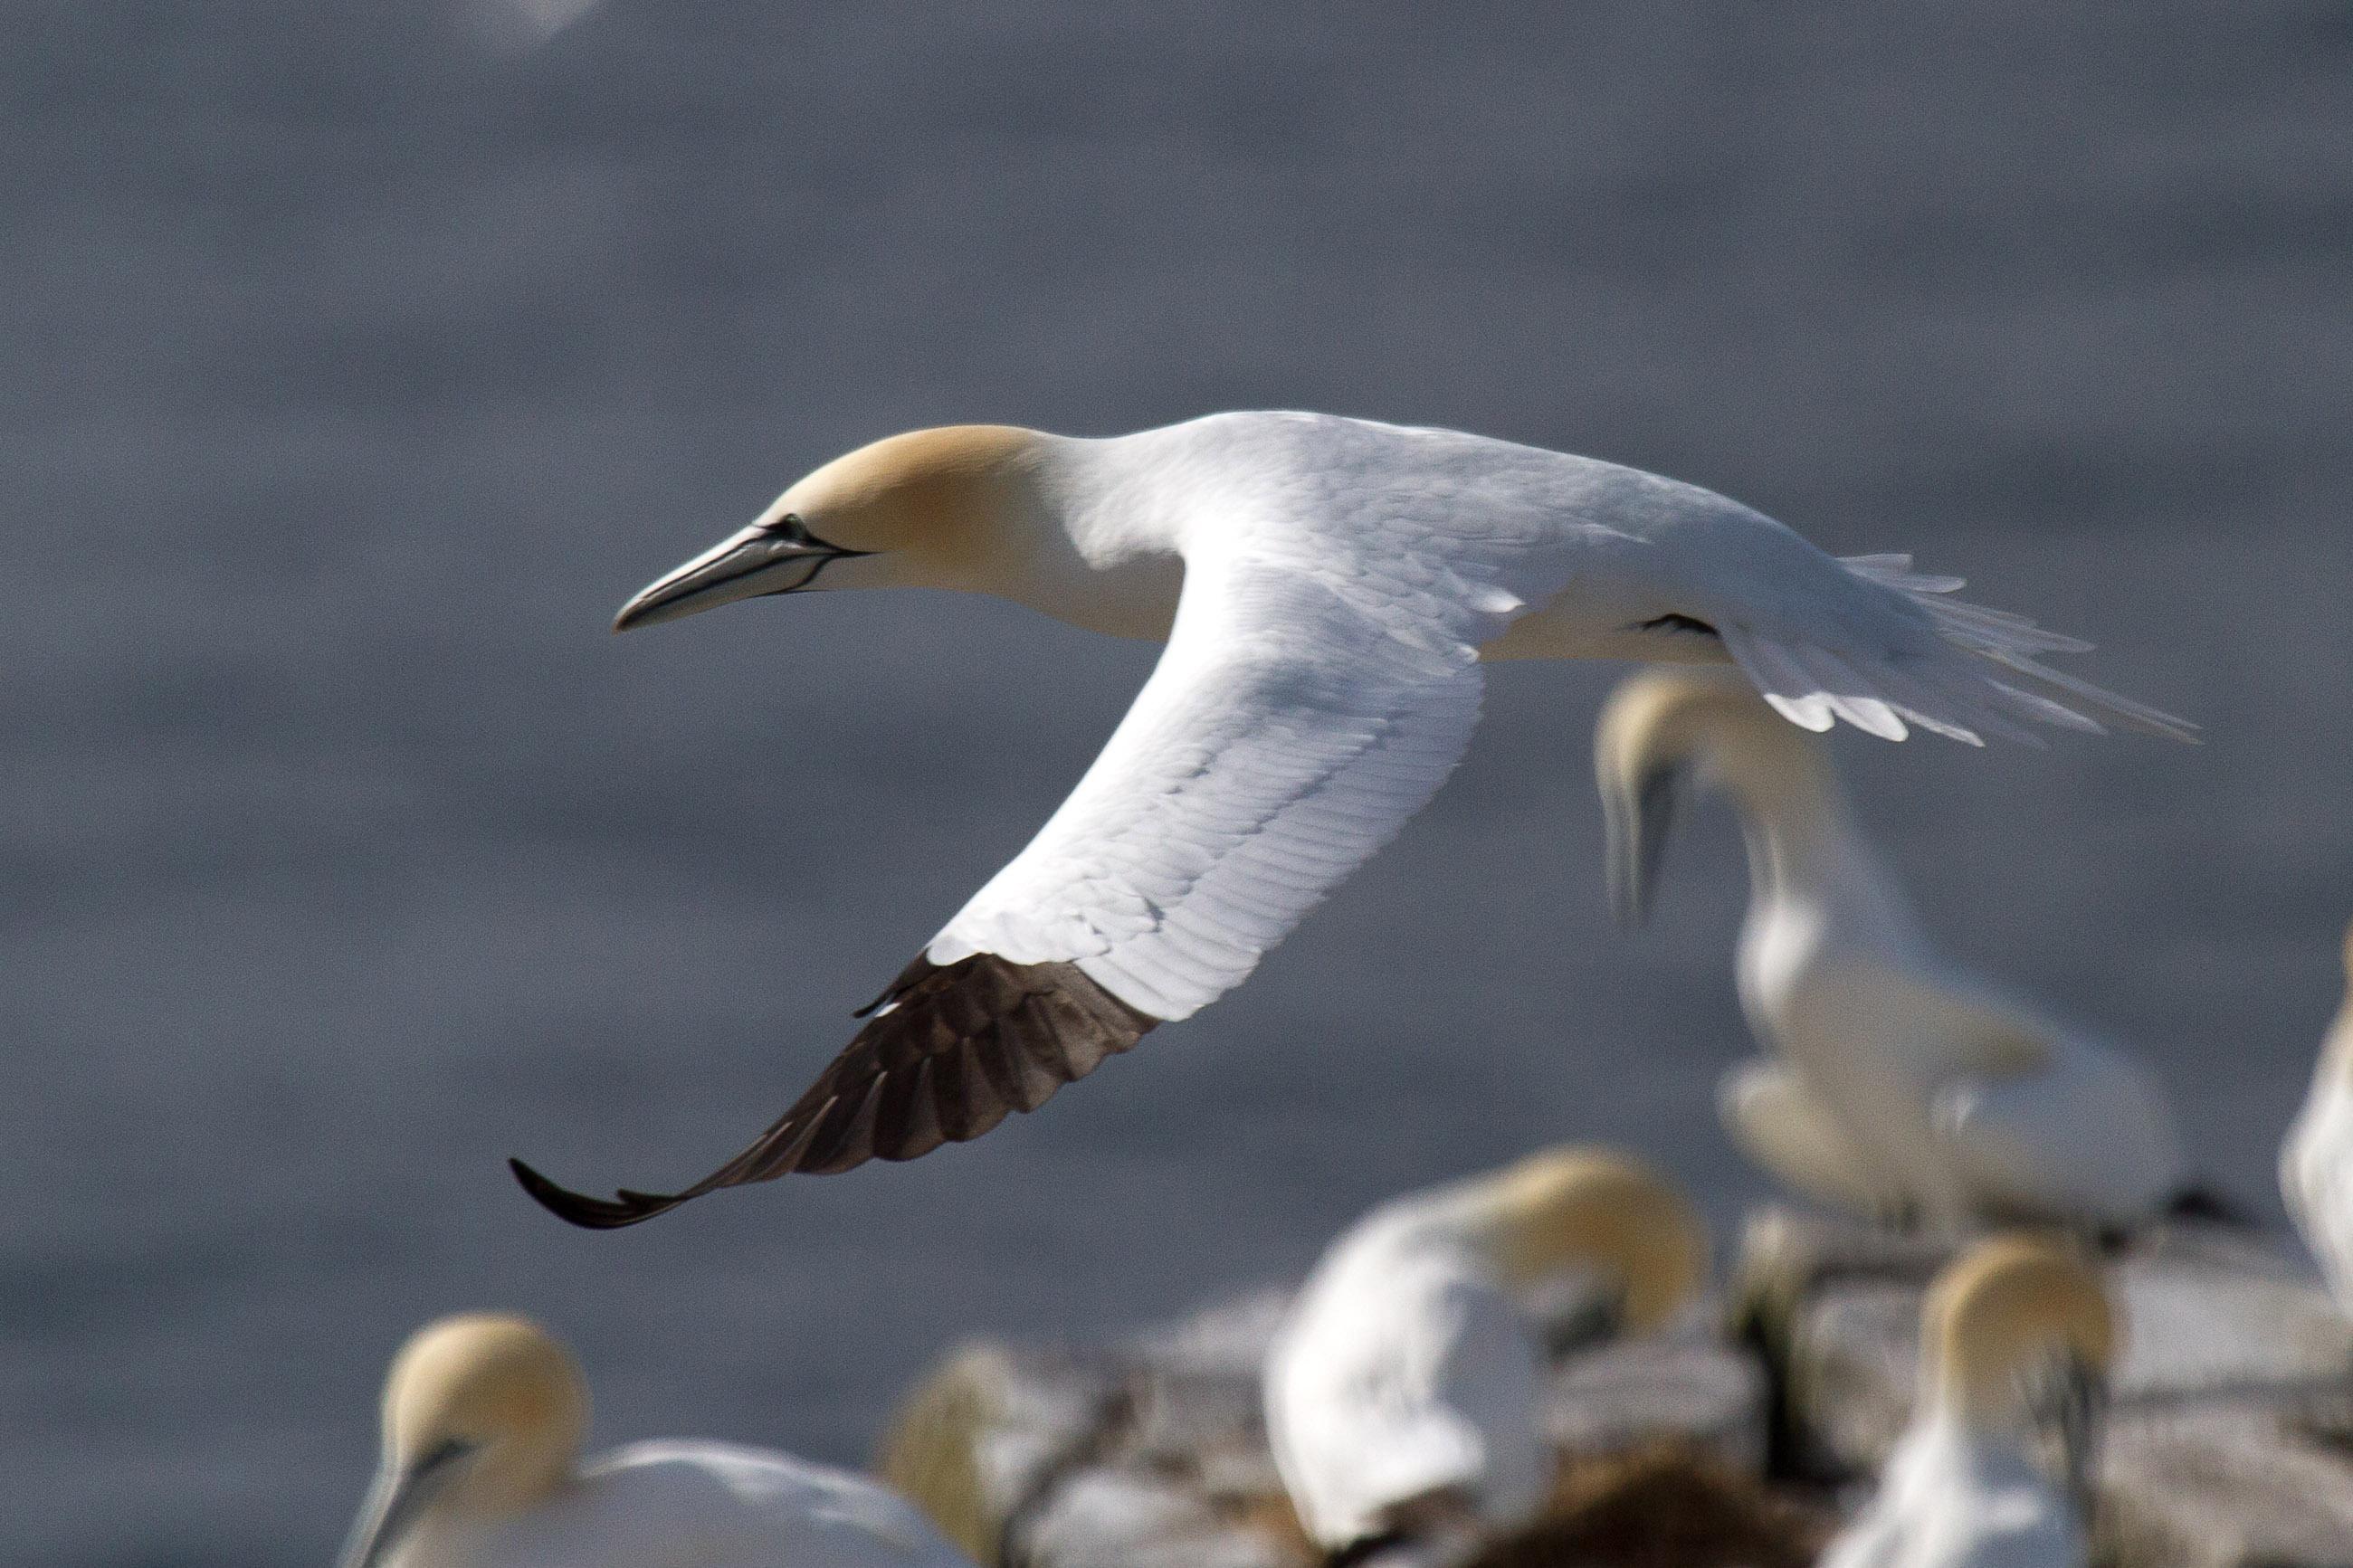 Gannet, Animal, Plumage, Mating, Morus, HQ Photo